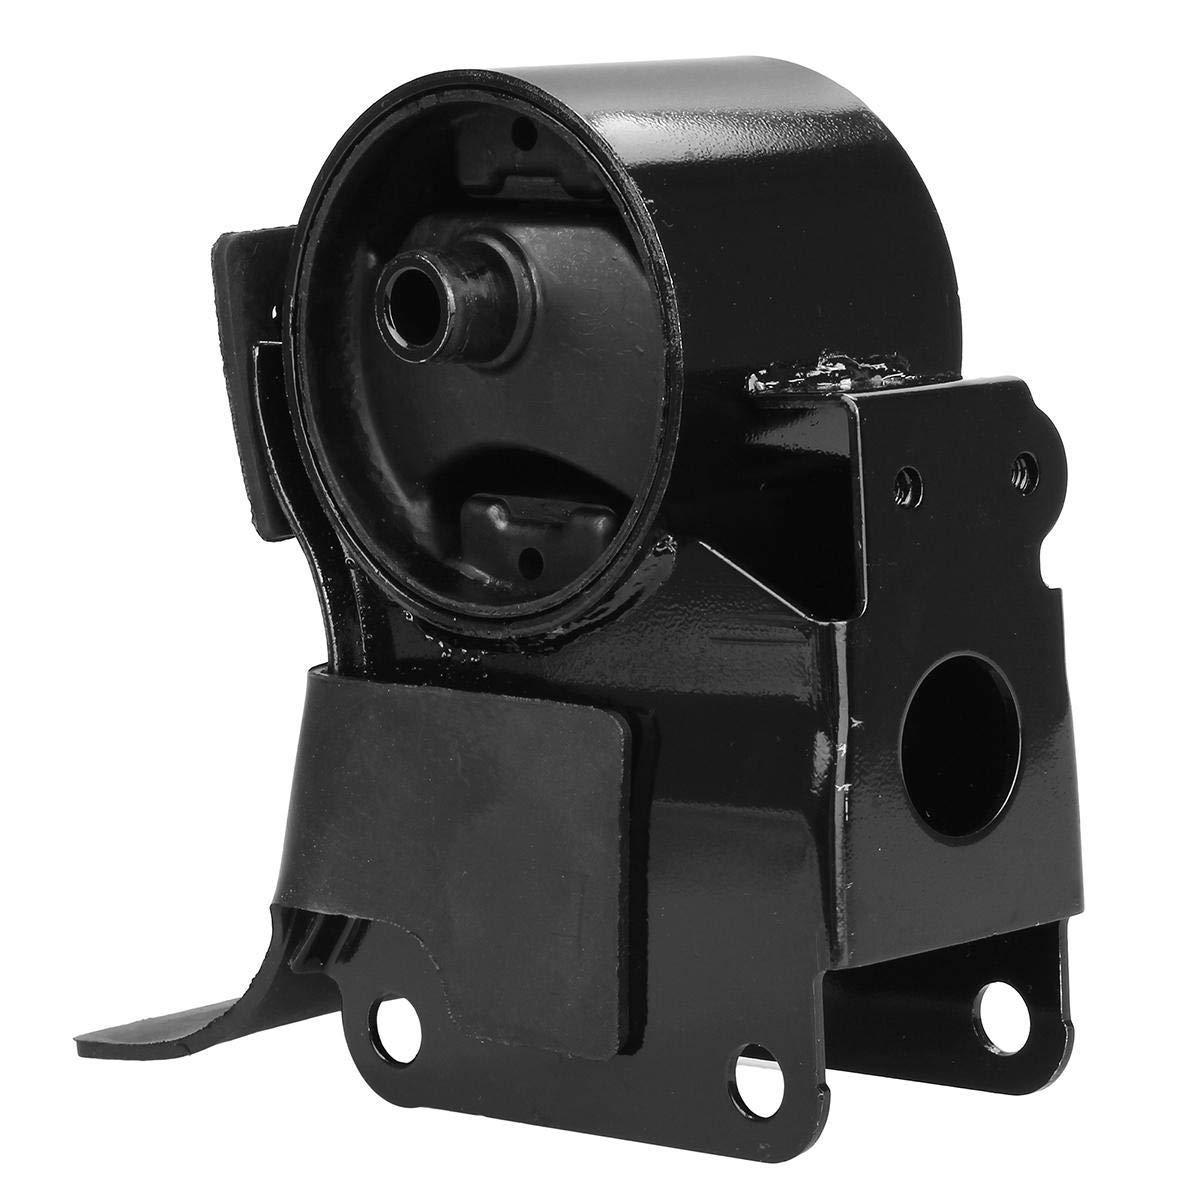 MAXMOUNT 4pcs//Set A7340 A7341 A7342 A7343 Transmission Engine Motor Mounts Replacement For 02-06 Nissan Altima 2.5L Auto